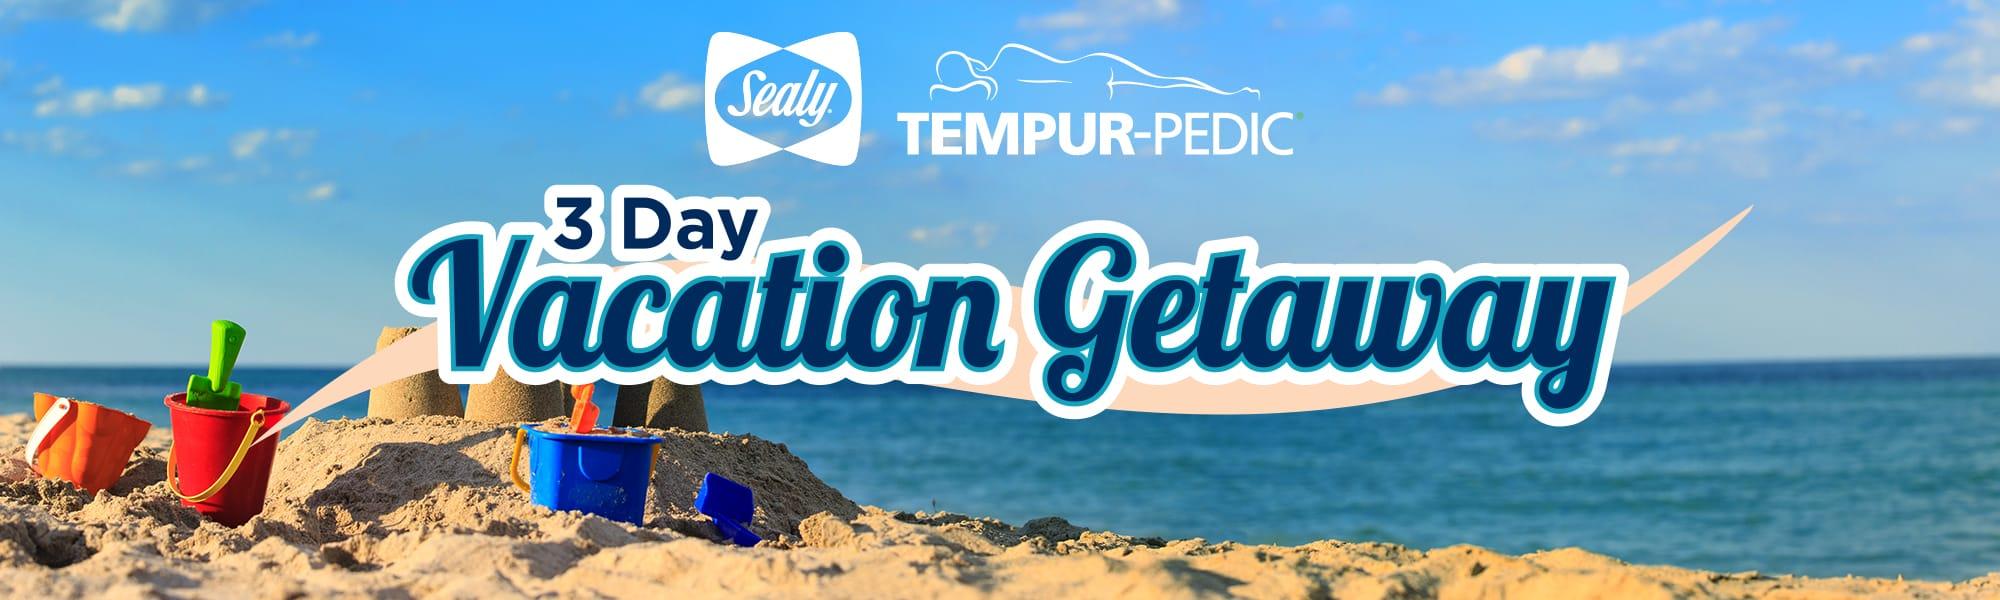 Getaway Giveaway Tempur Sealy Promo